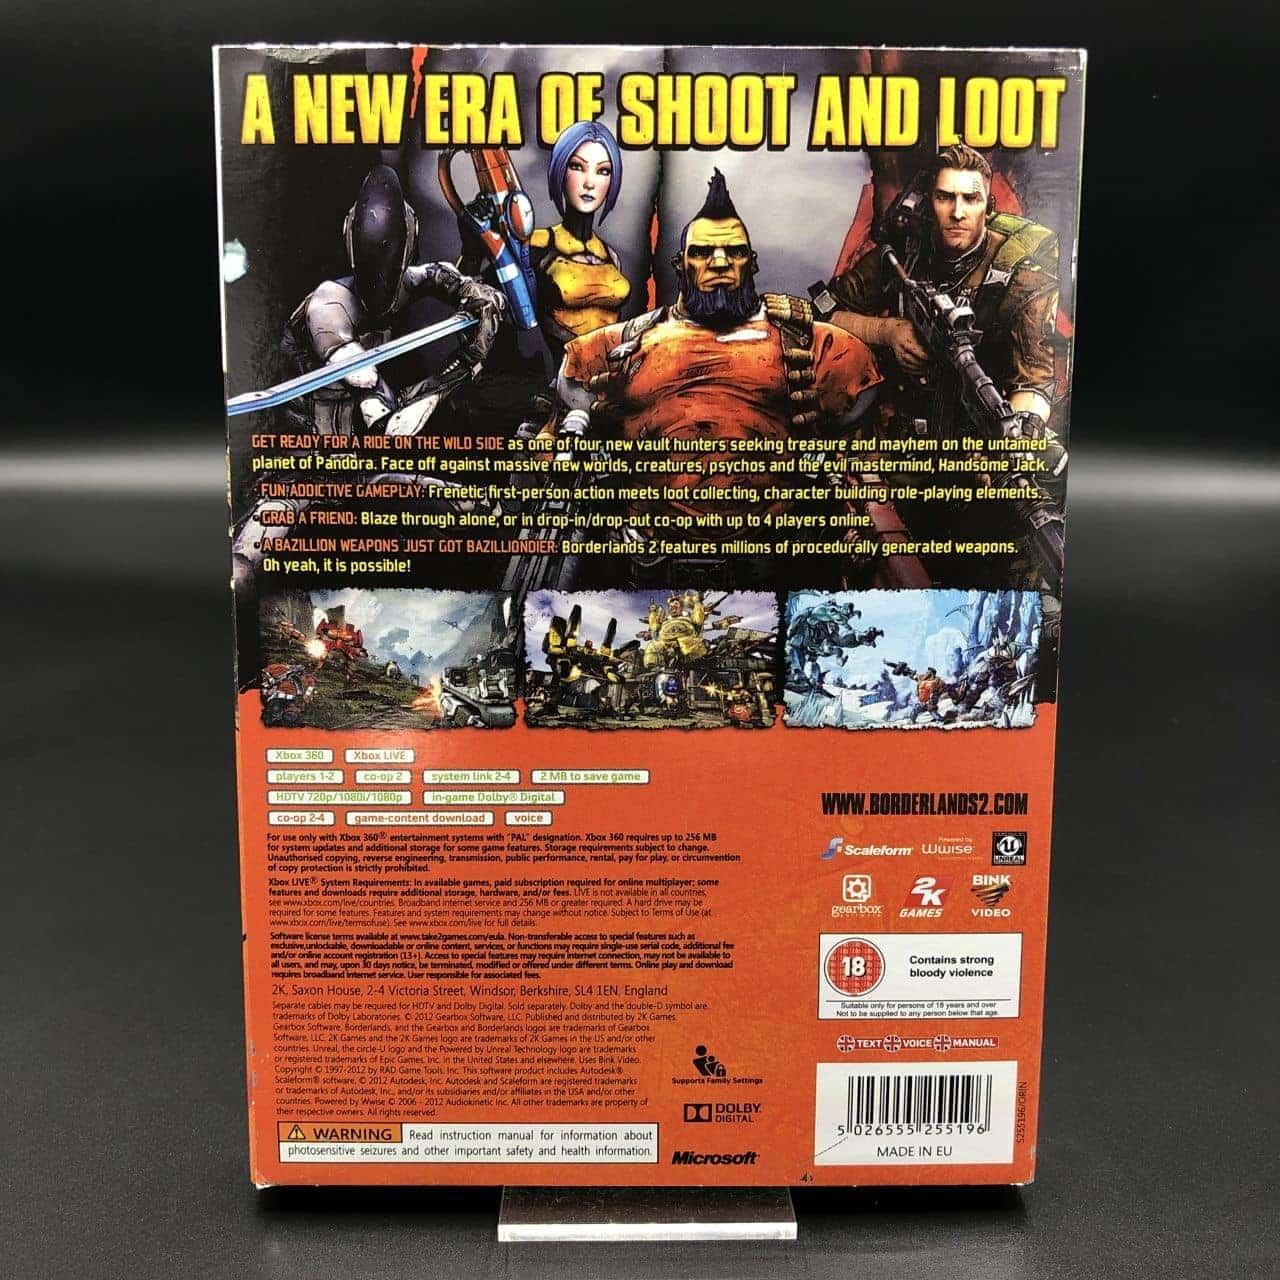 Borderlands 2 (Komplett) (Sehr gut) XBOX 360 (FSK18)